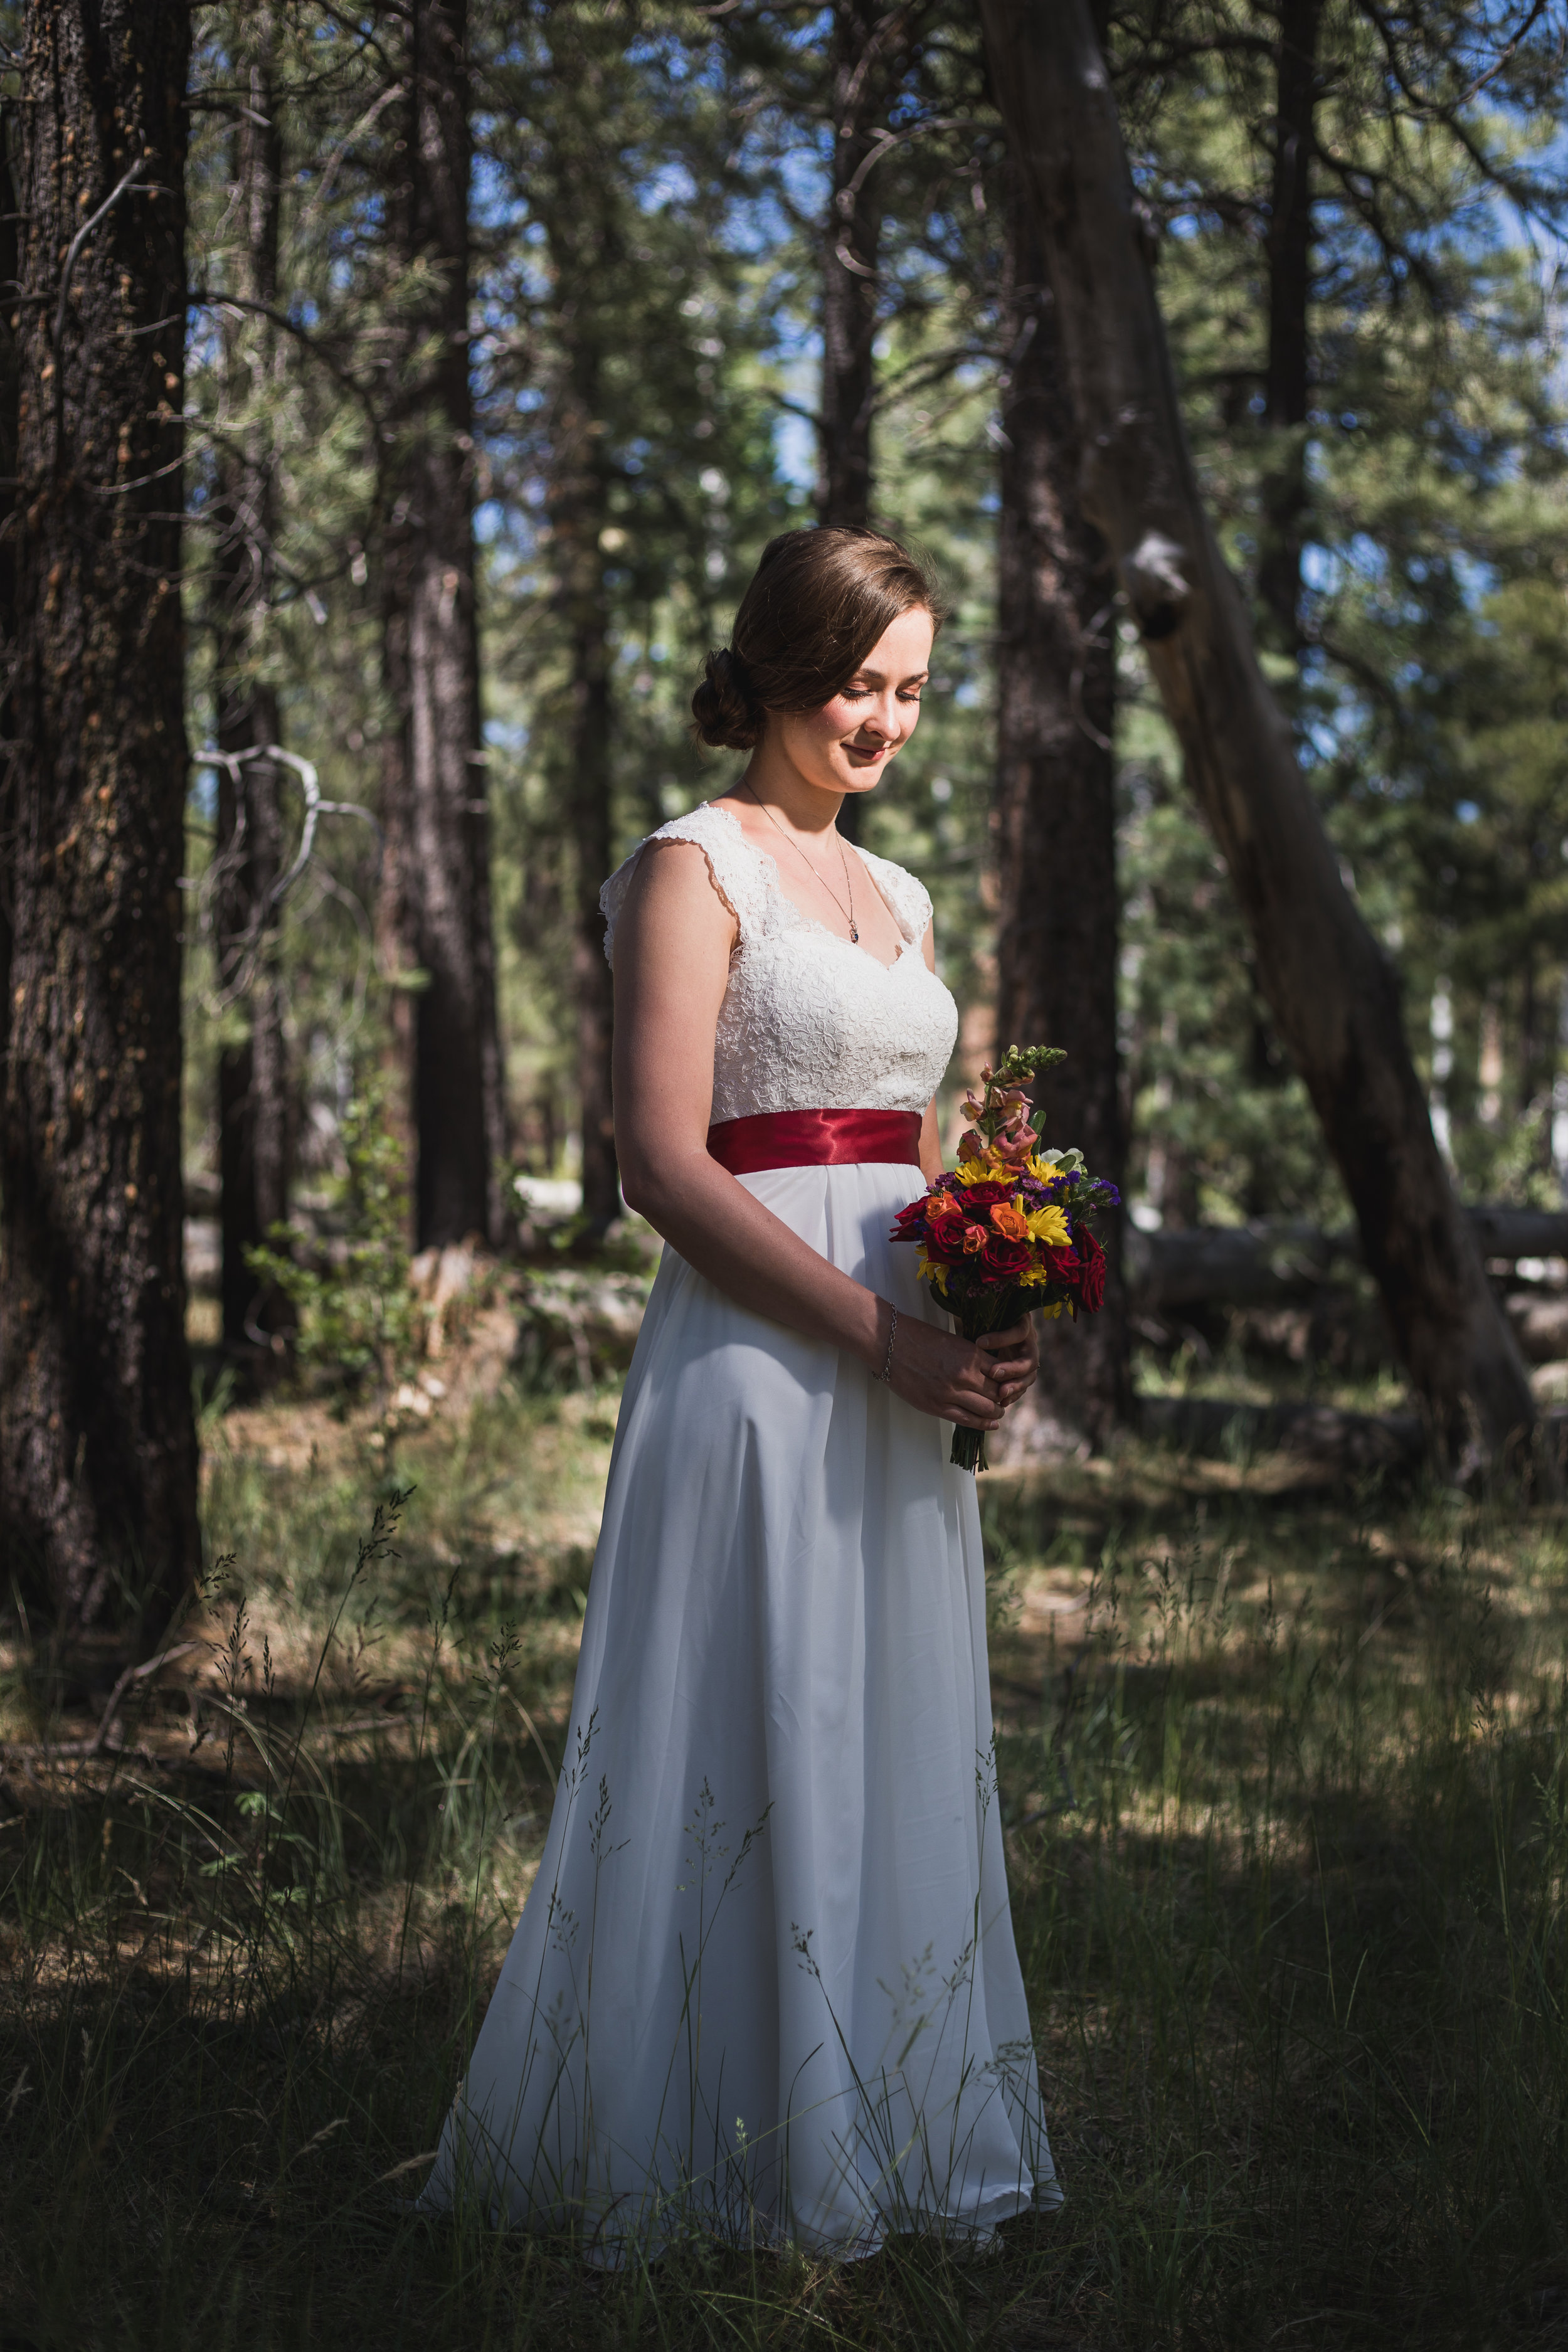 flagstaff-nordic-center-wedding-6.jpg